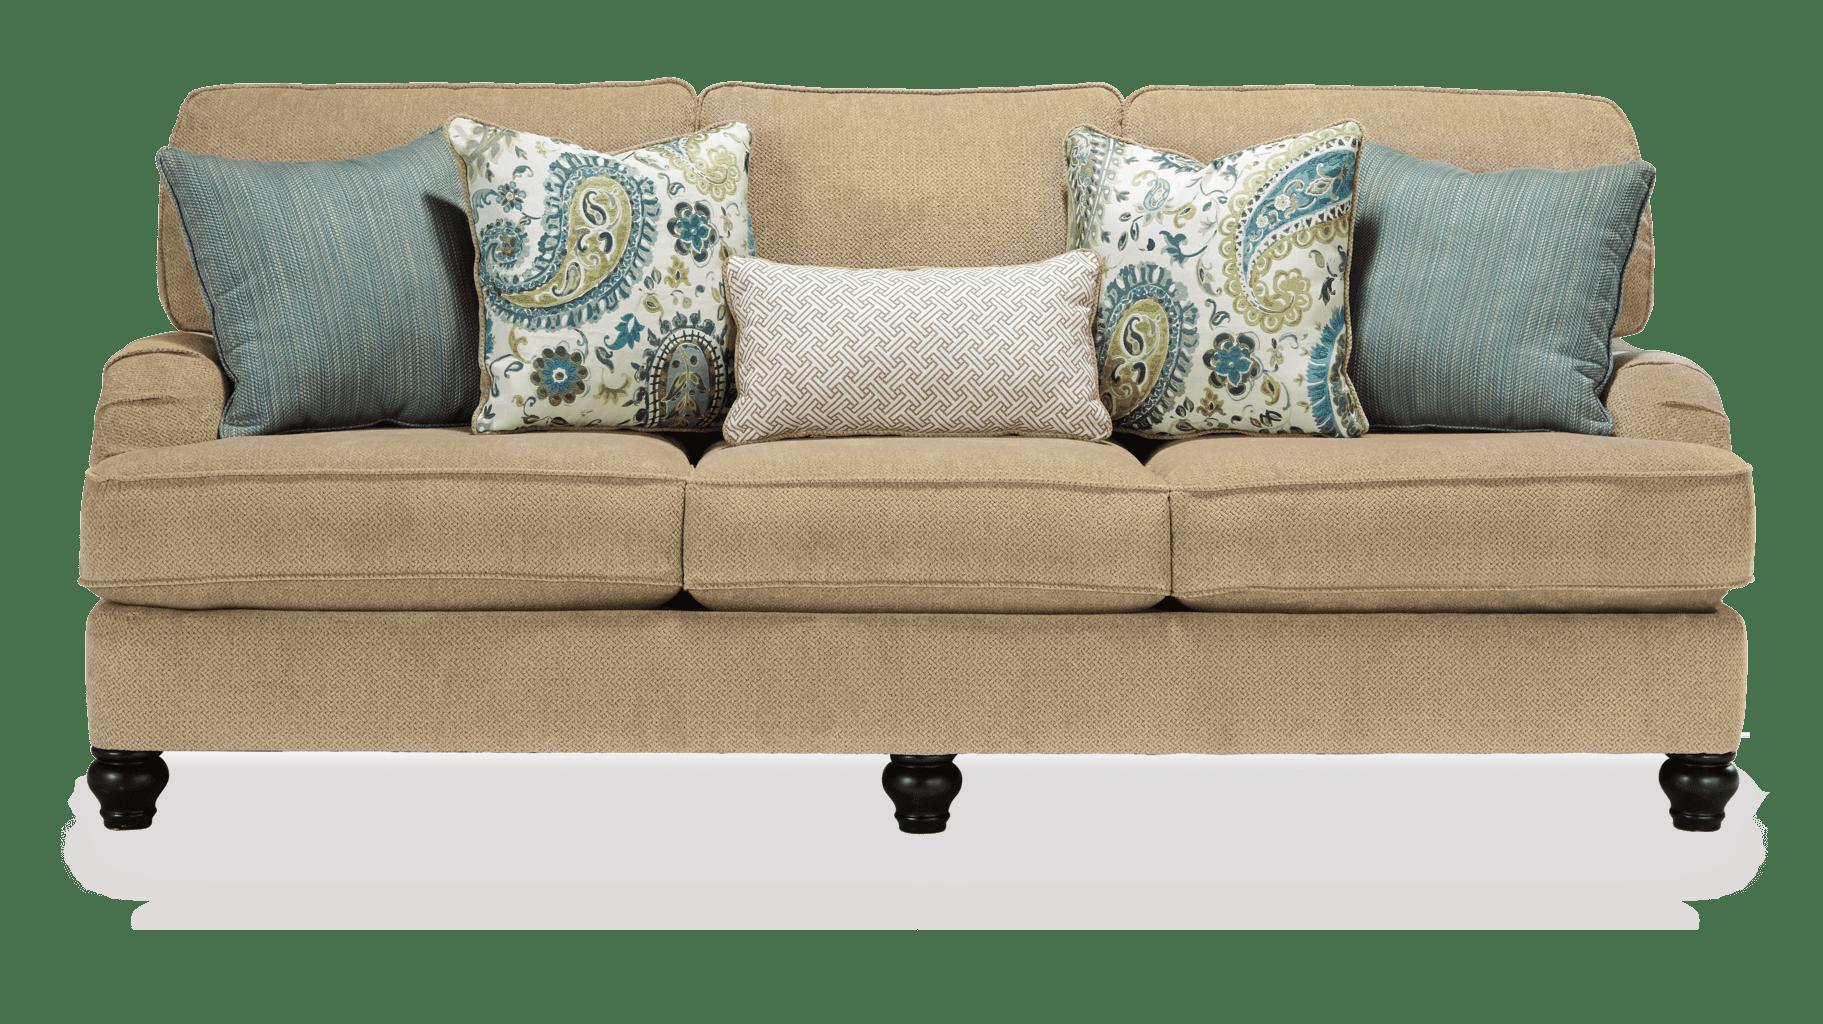 Sofa Png Evansville Overstock Warehouse